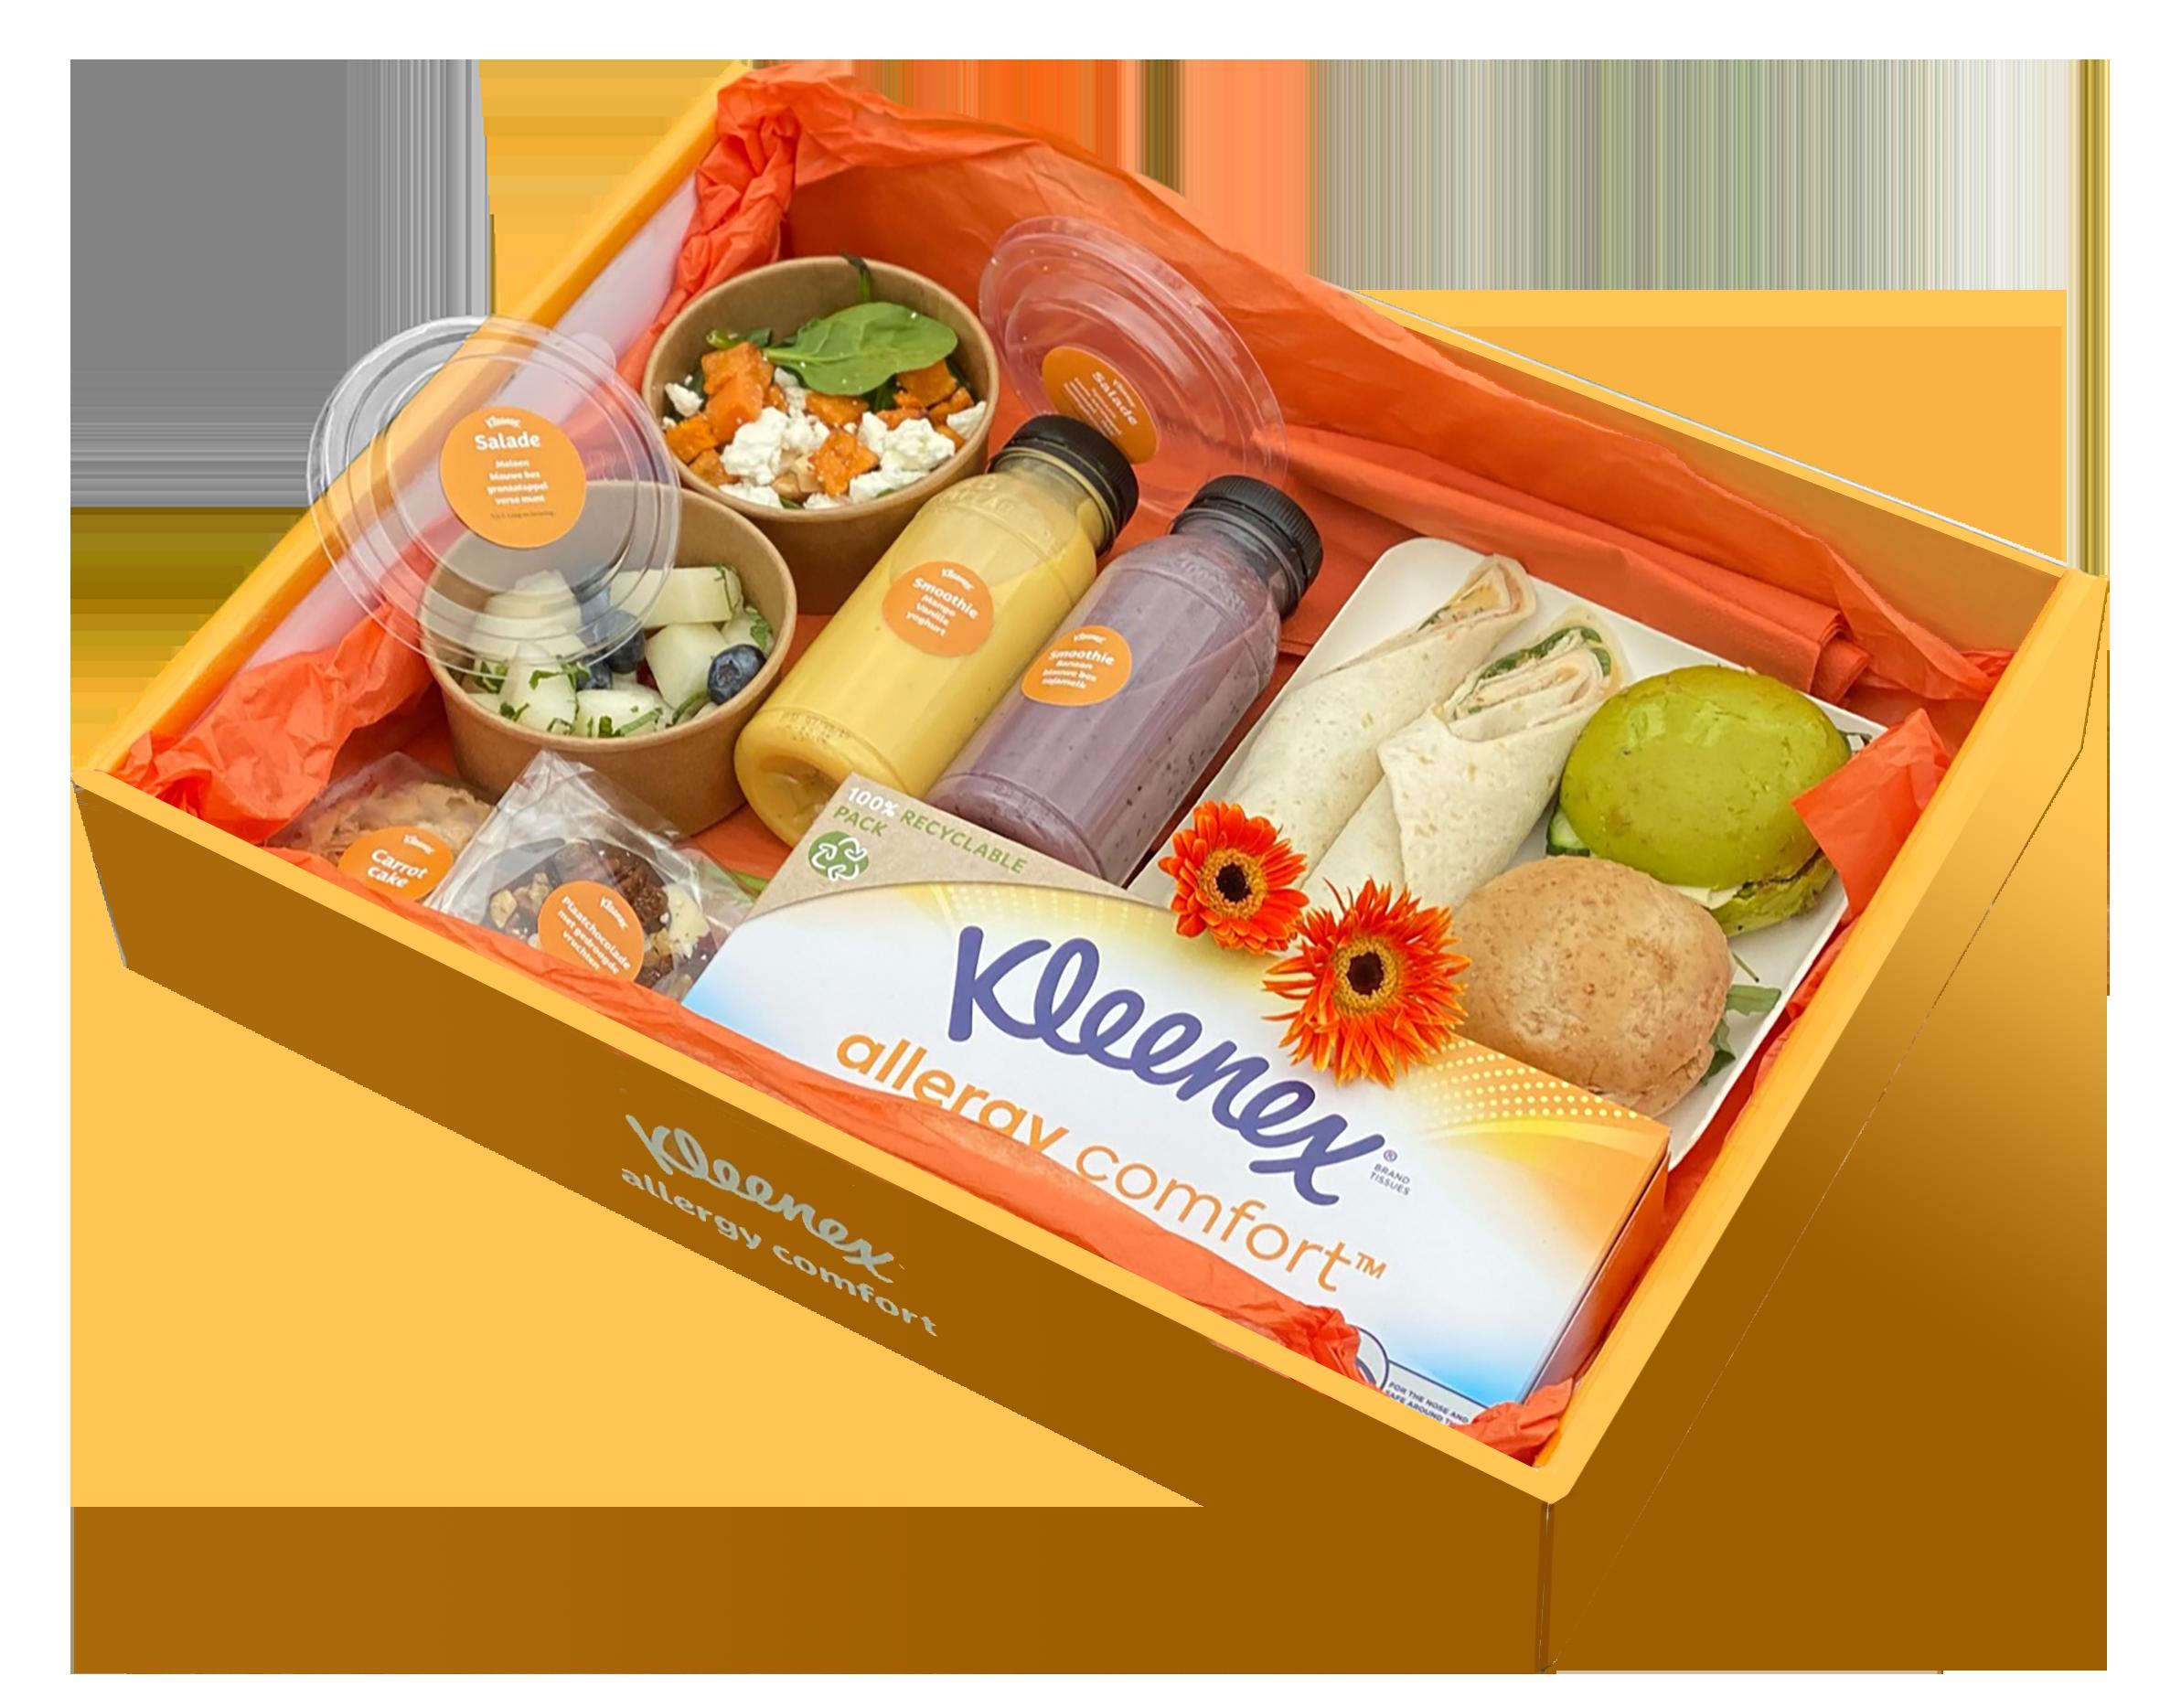 Kleenex-Allergy-Picknick-box (1)